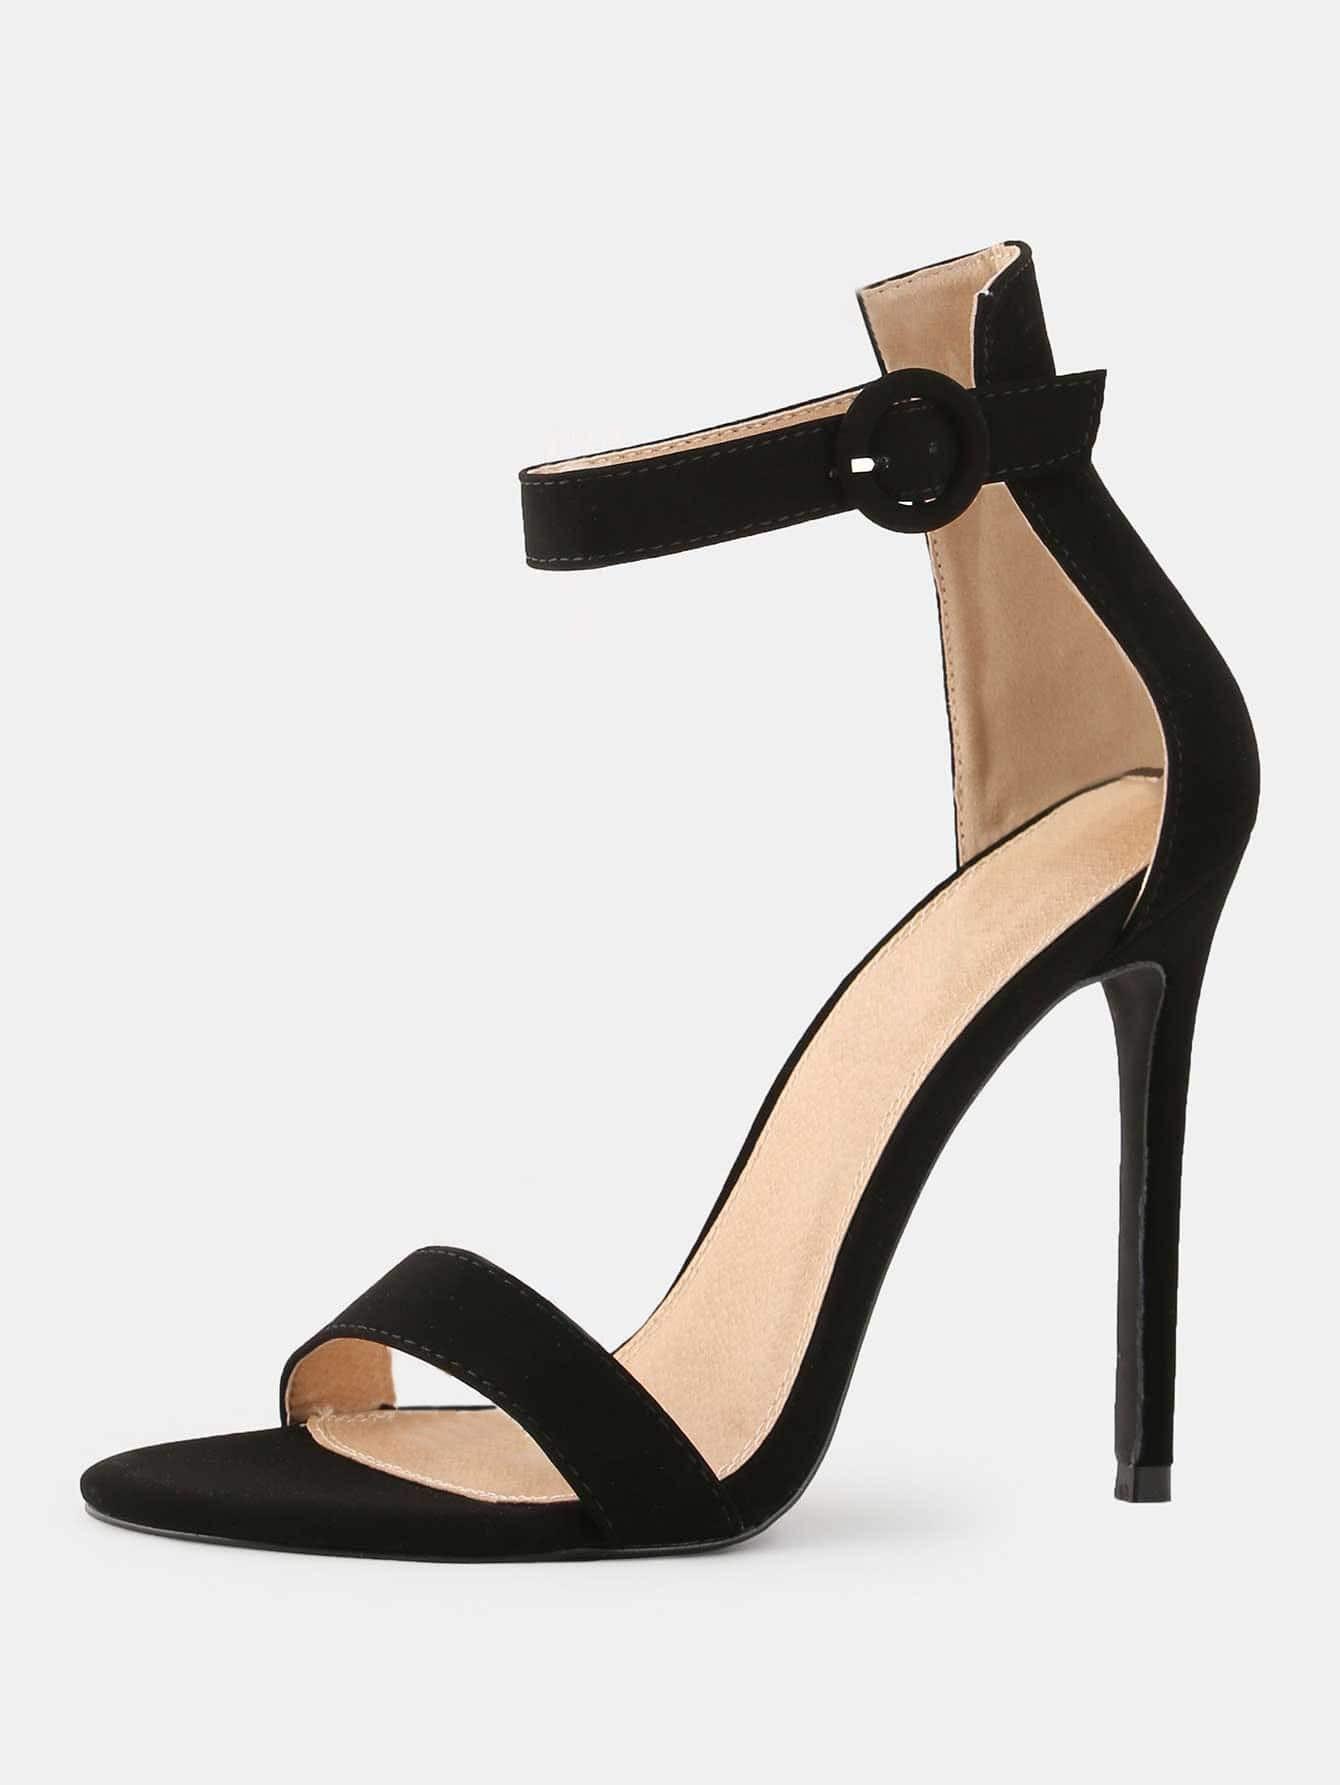 2672d3f091 FINEJO Women's High Heel Fashion Sandals Peep Toe Pumps For Wedding Party  Dress Stiletto Black 39